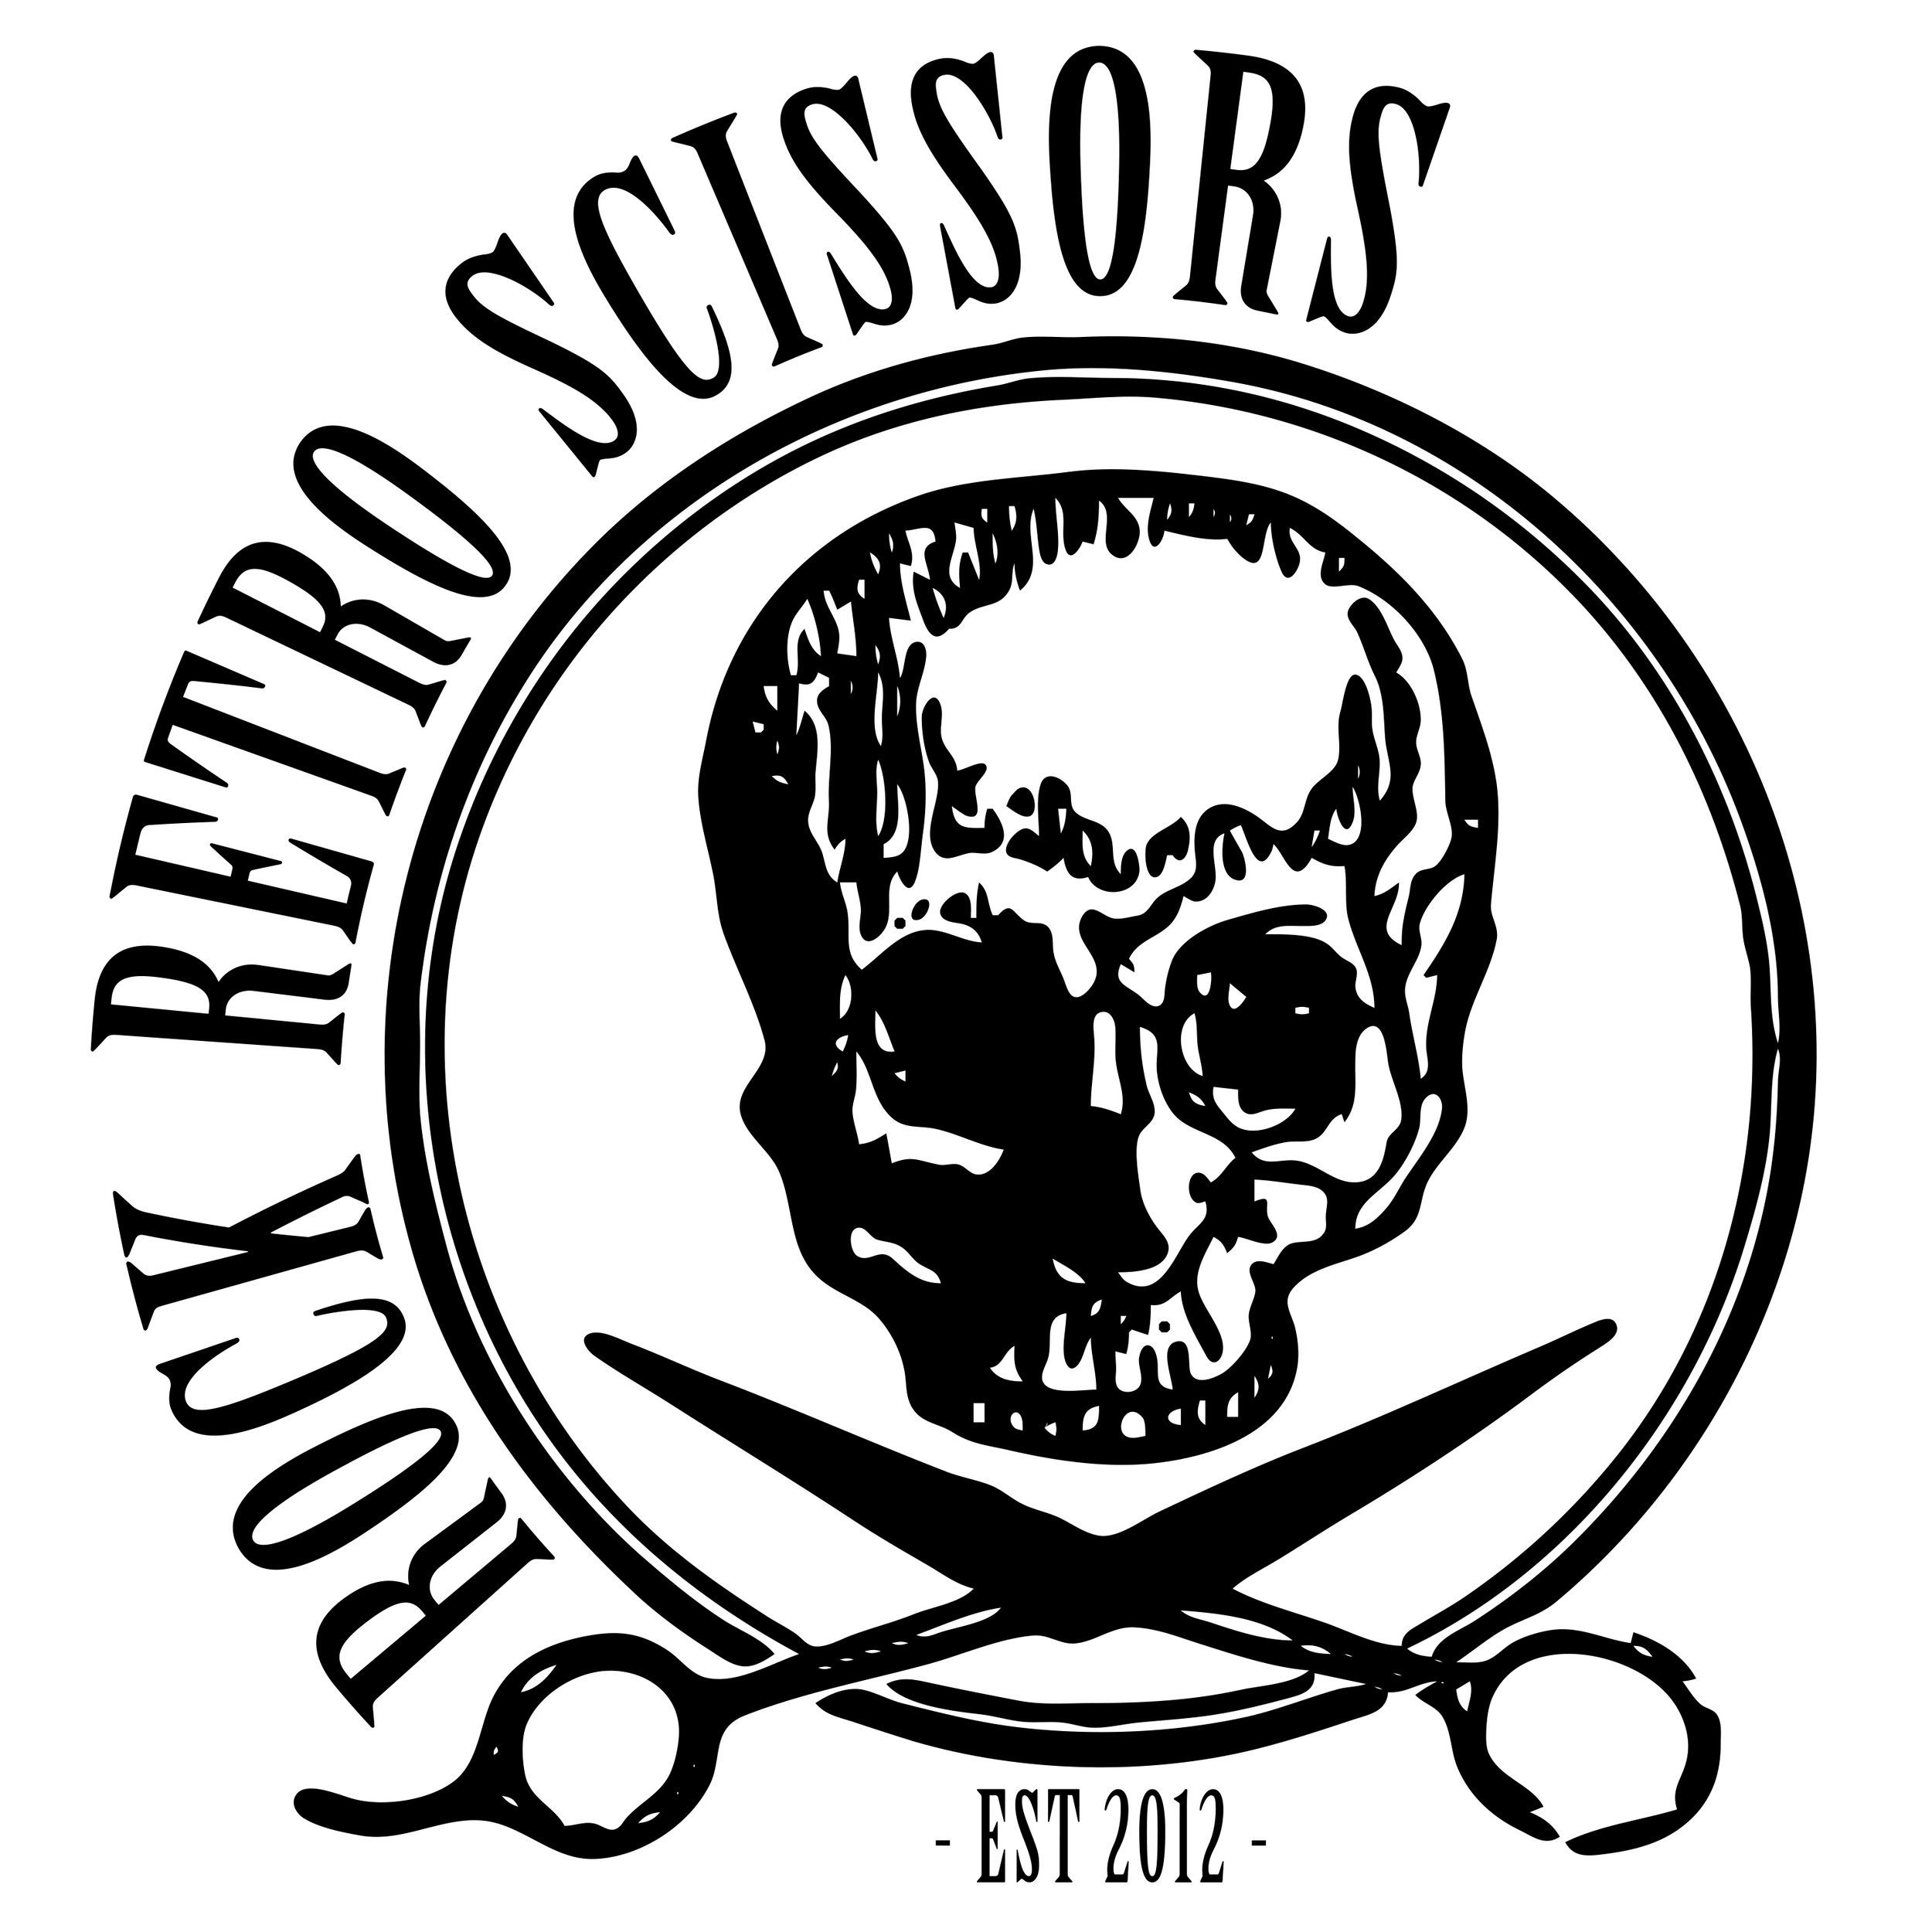 skull_and_scissors_5_flat_smol.jpg